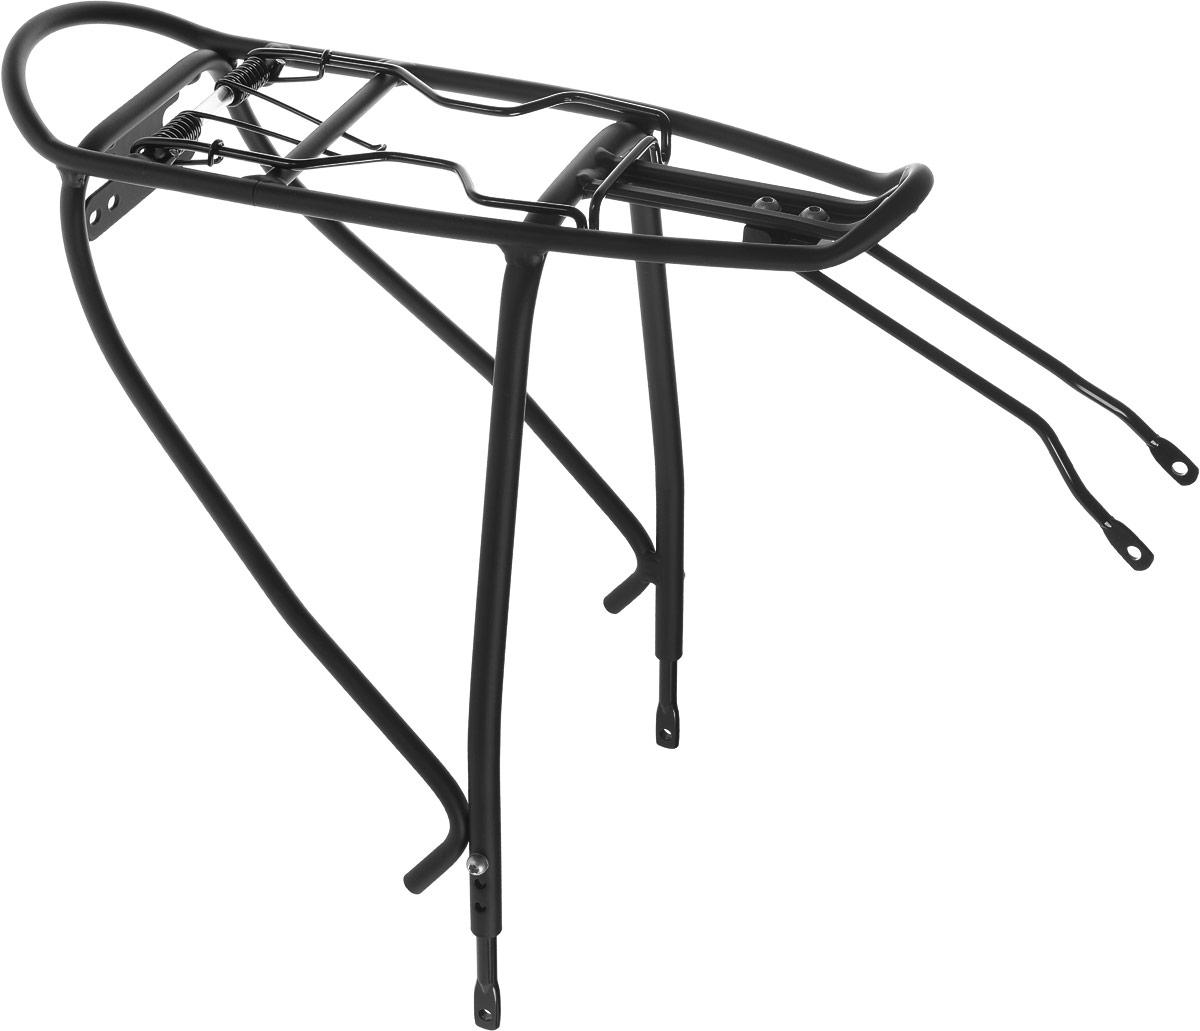 Багажник велосипедный Stern. CCAR-2N